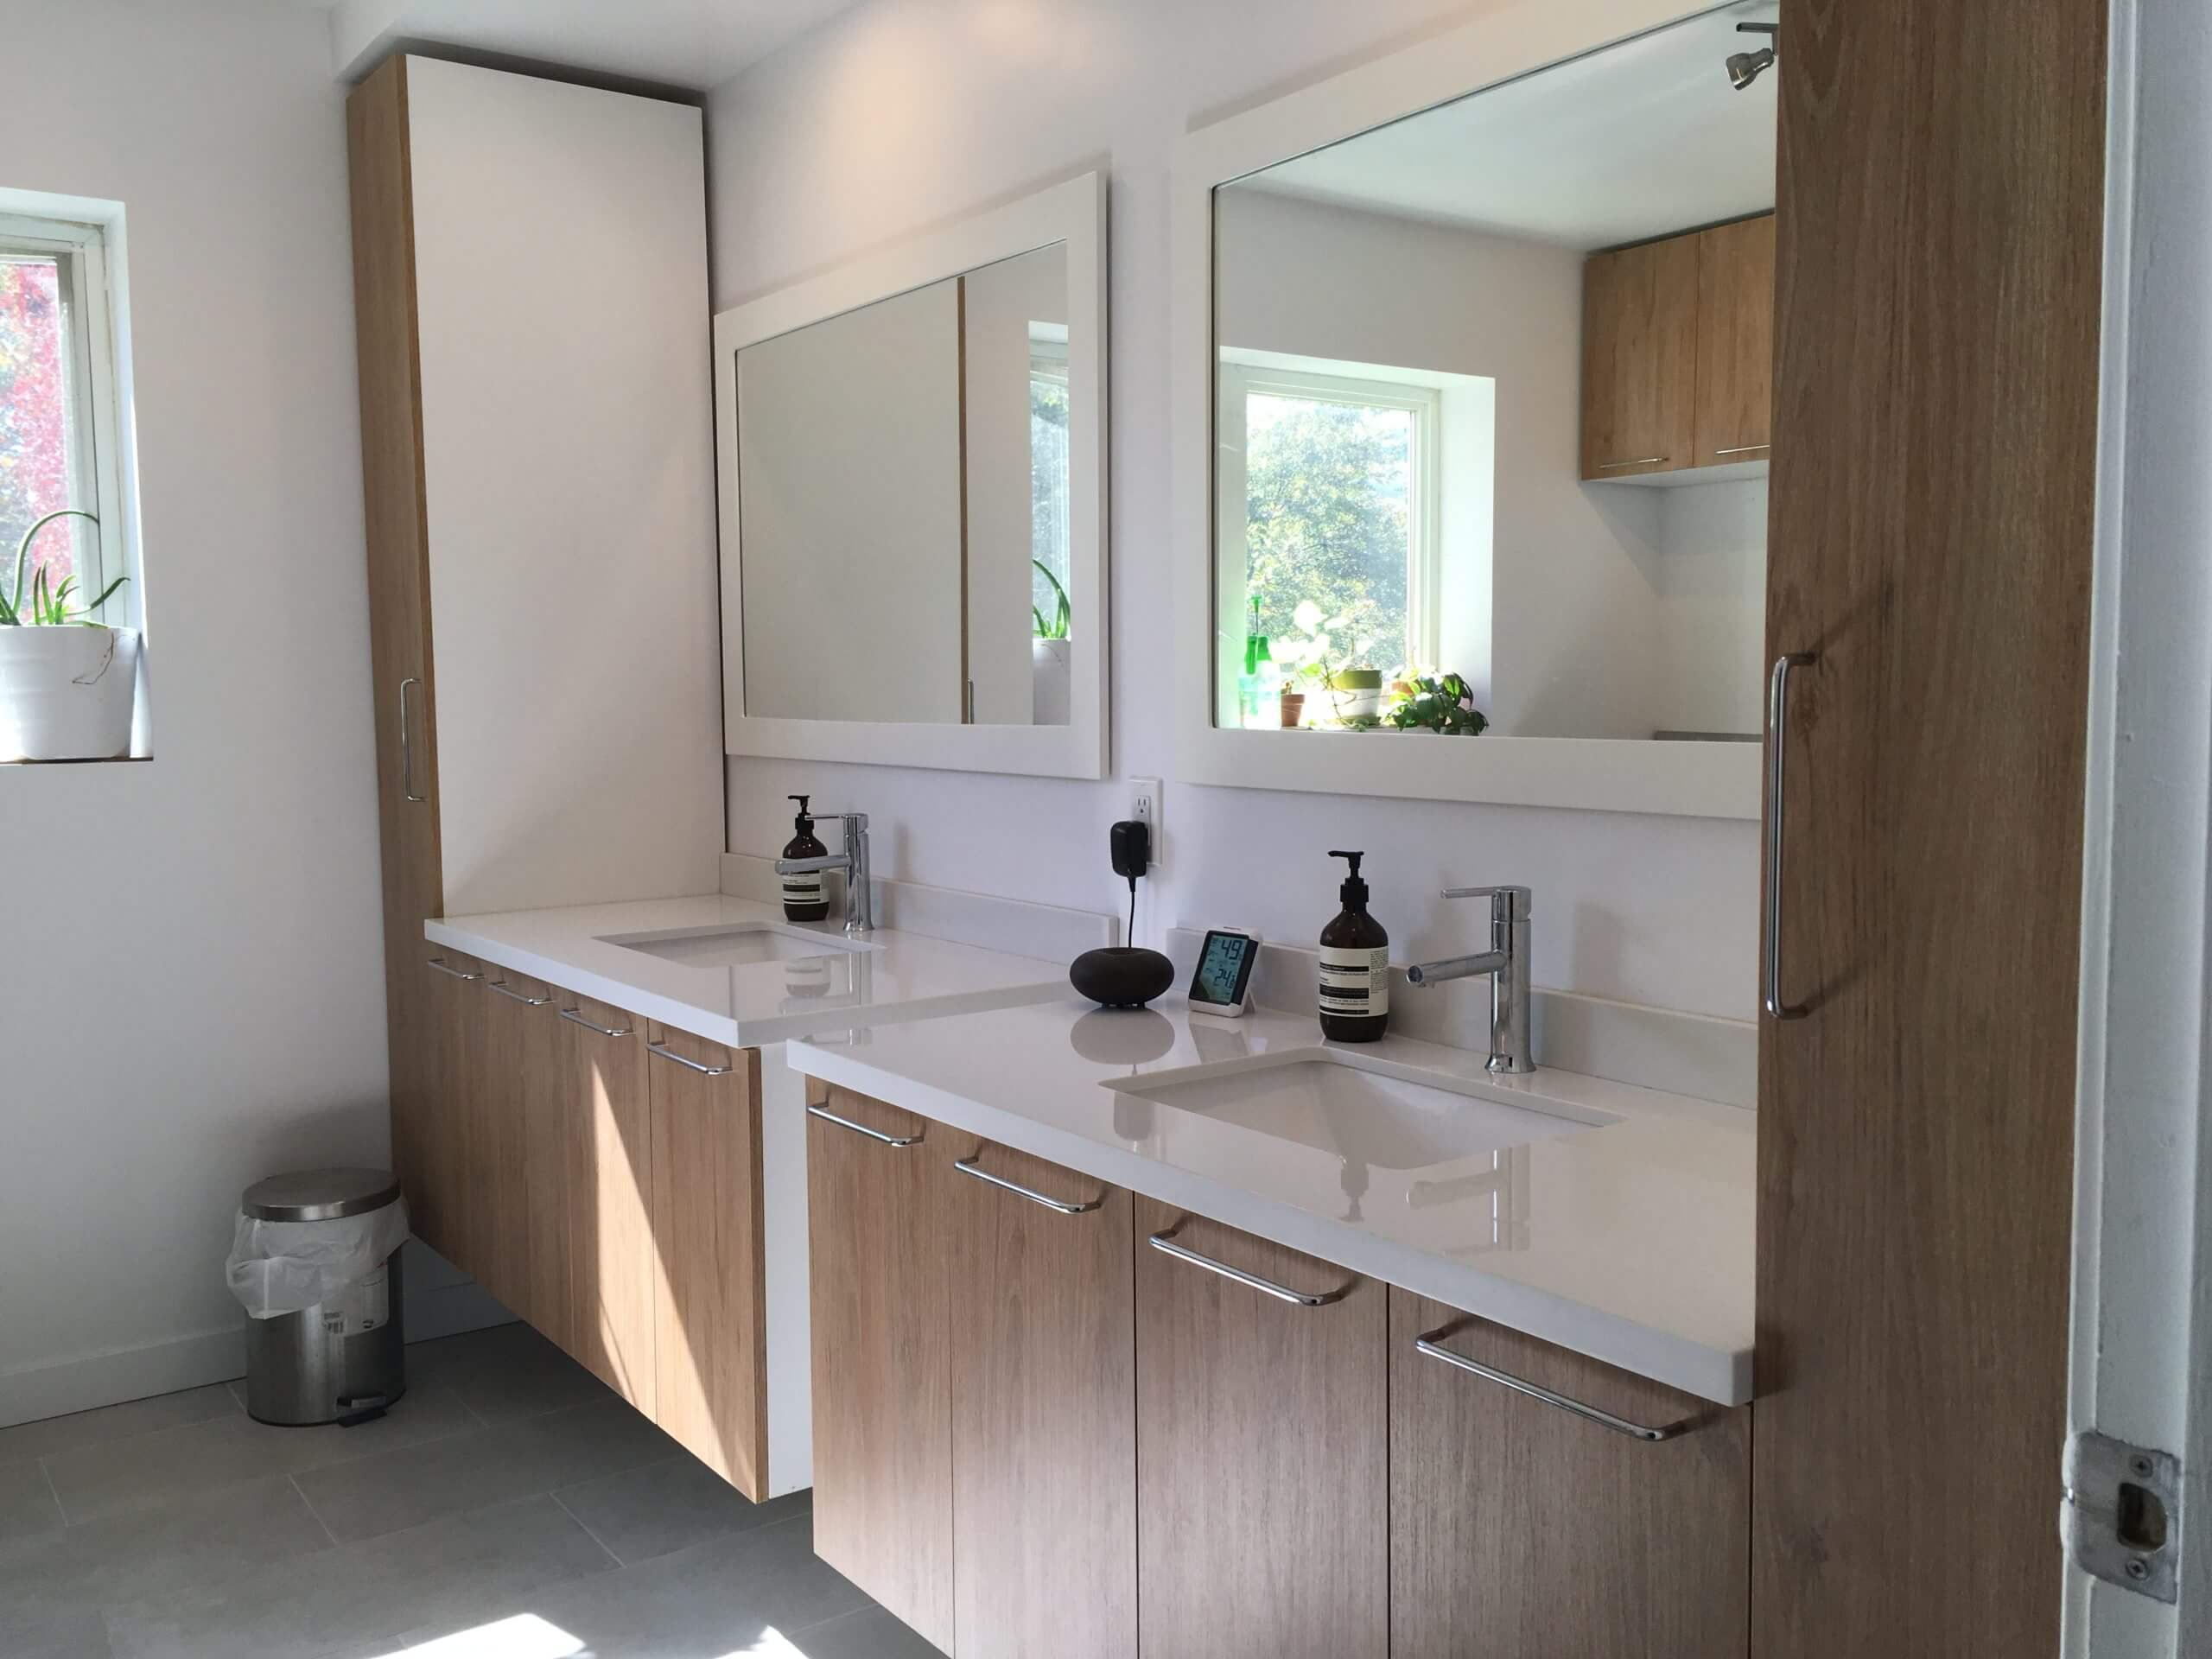 modern bathroom cabinetry and vanities in Montreal